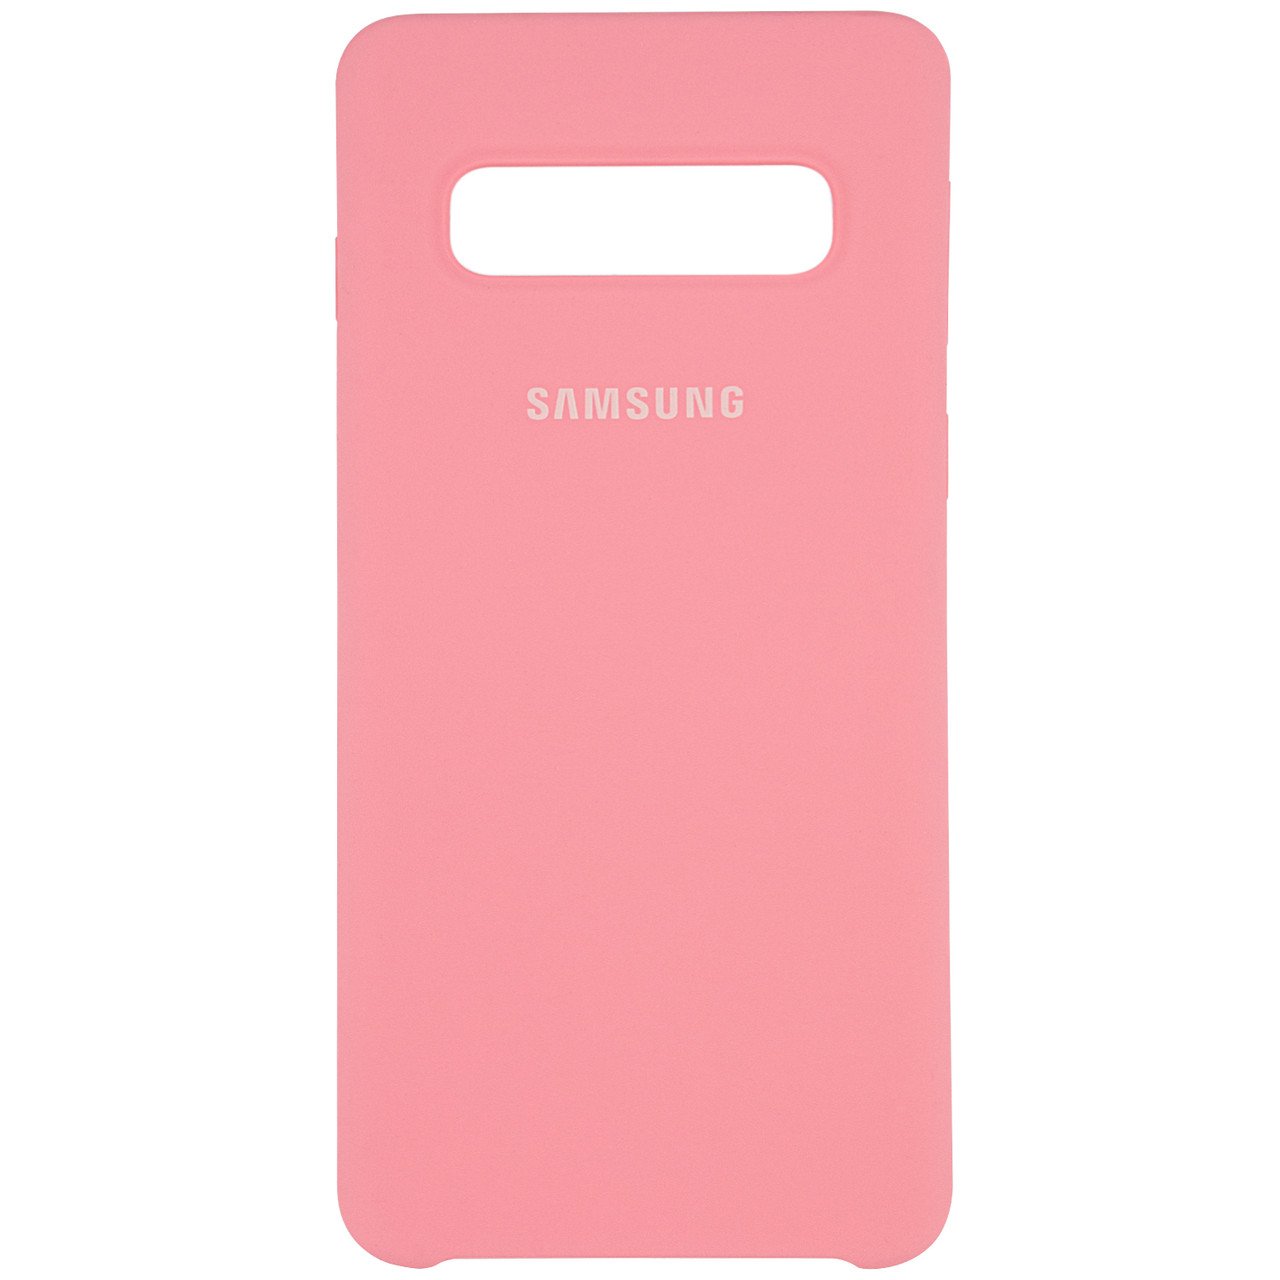 Чехол Silicone case для Samsung Galaxy S10